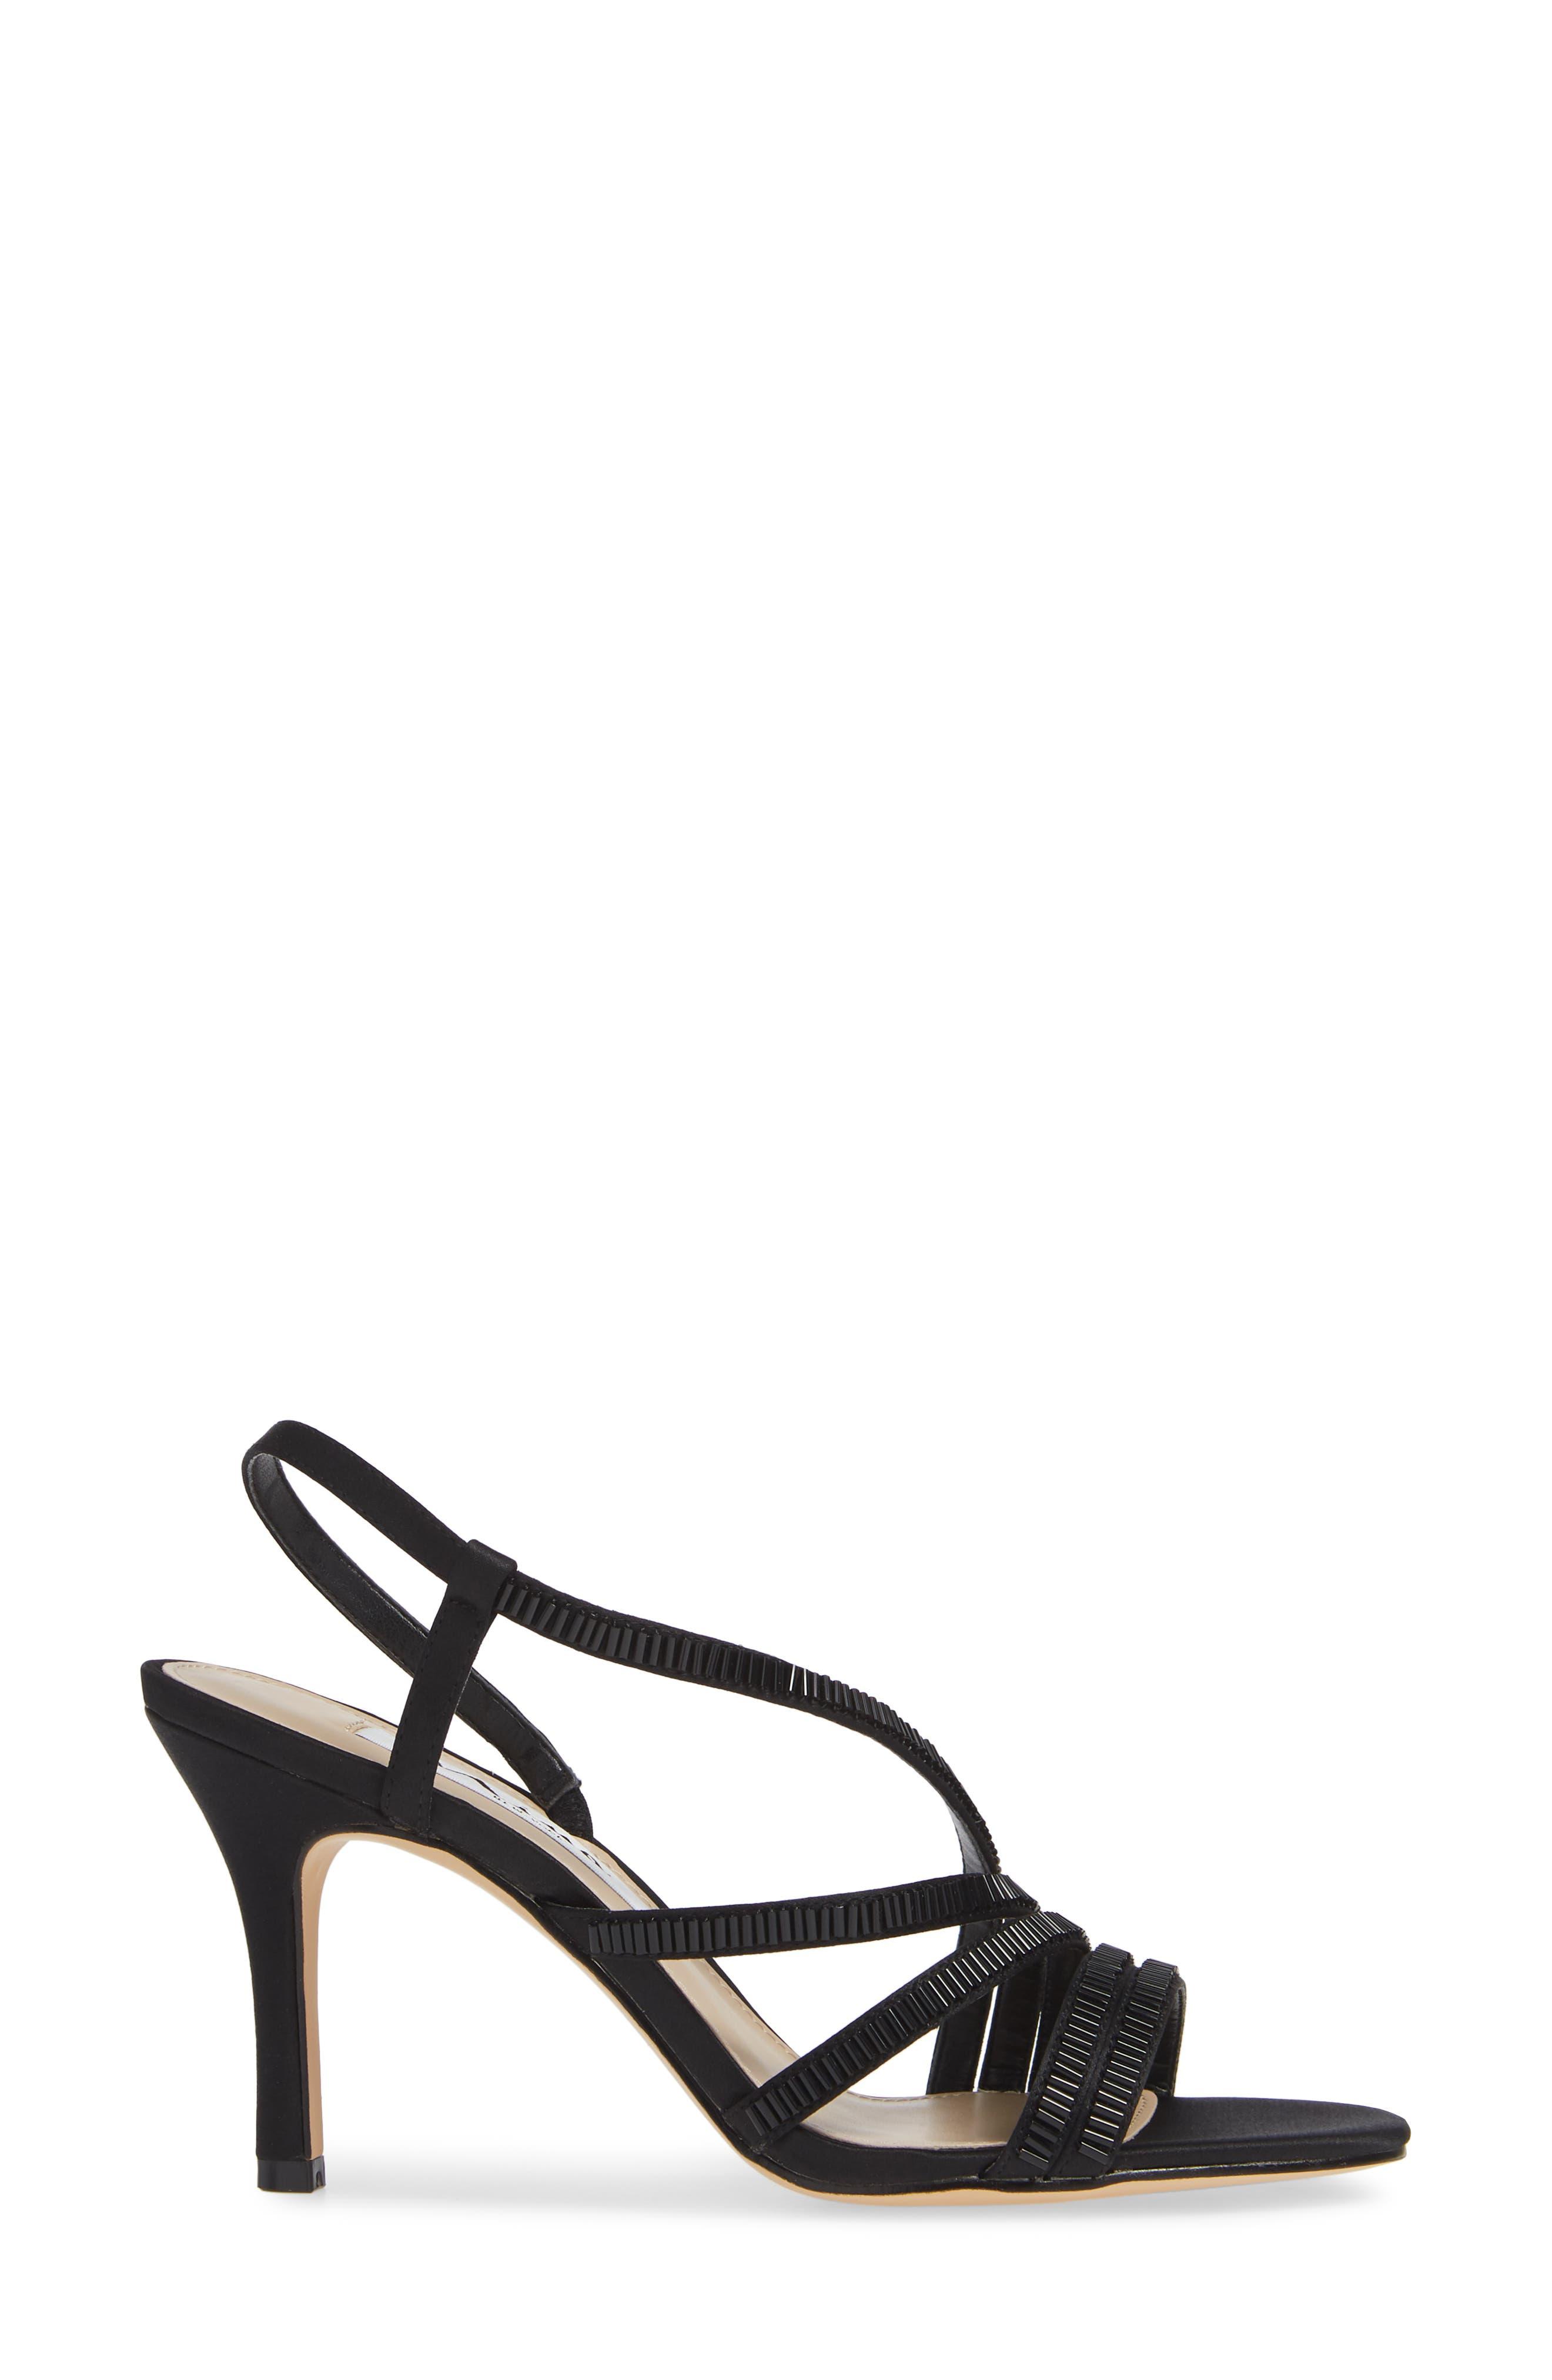 Amani Asymmetrical Strappy Slingback Sandal,                             Alternate thumbnail 3, color,                             003